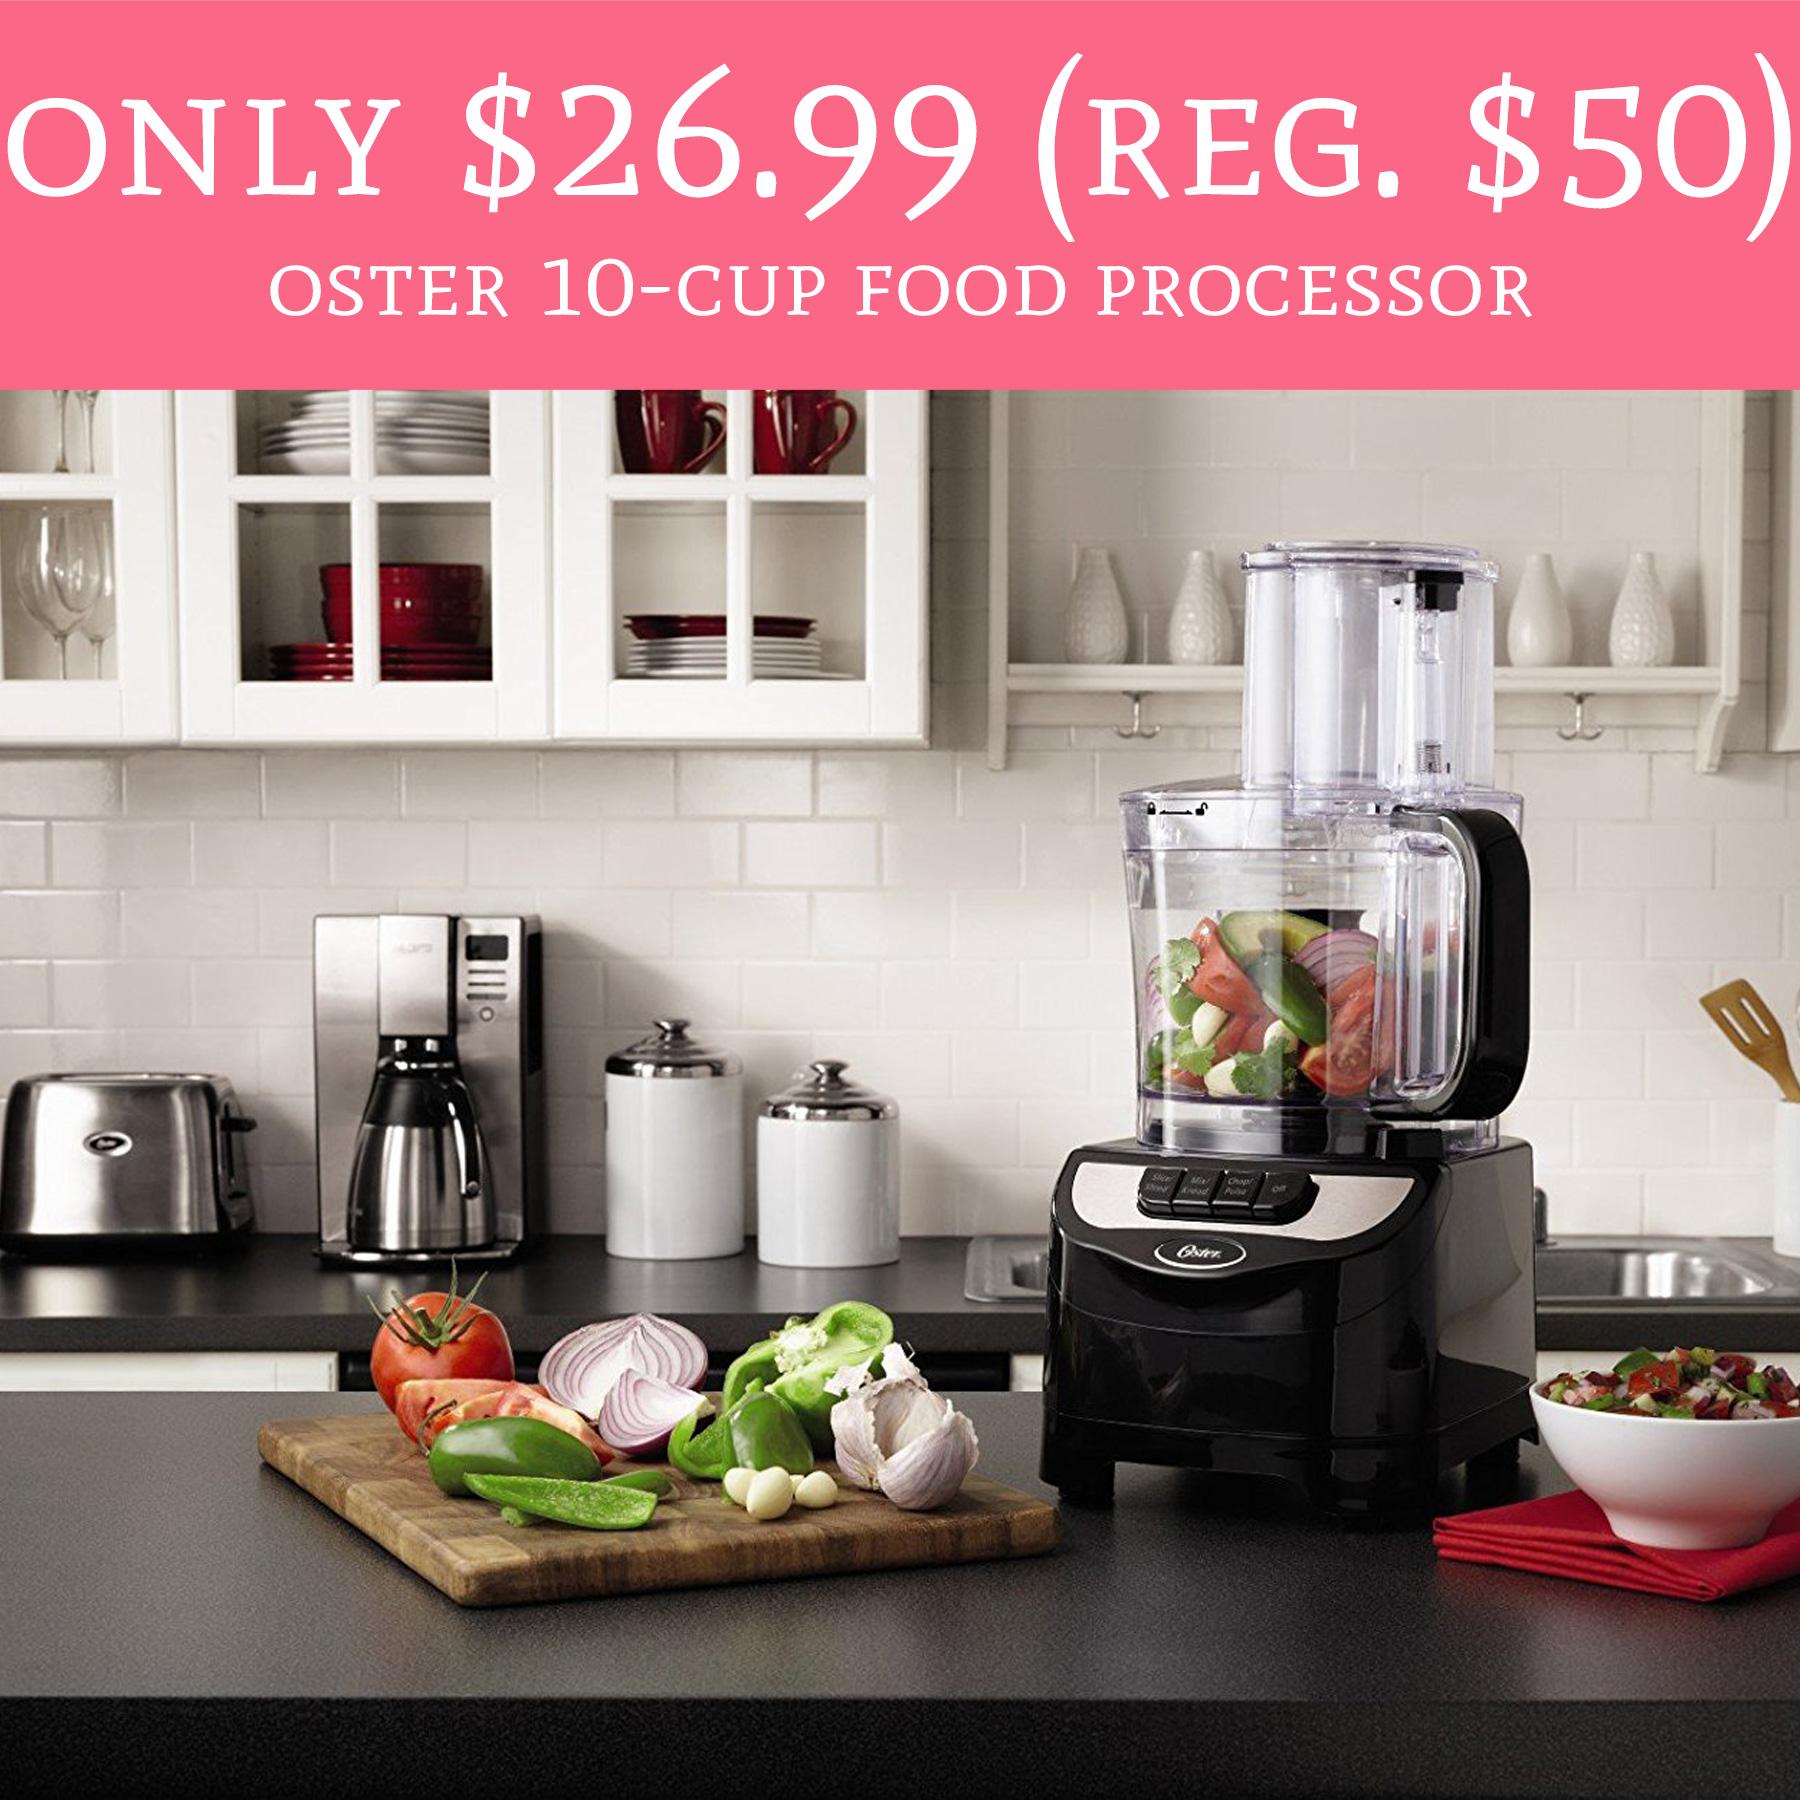 Deals on food processors